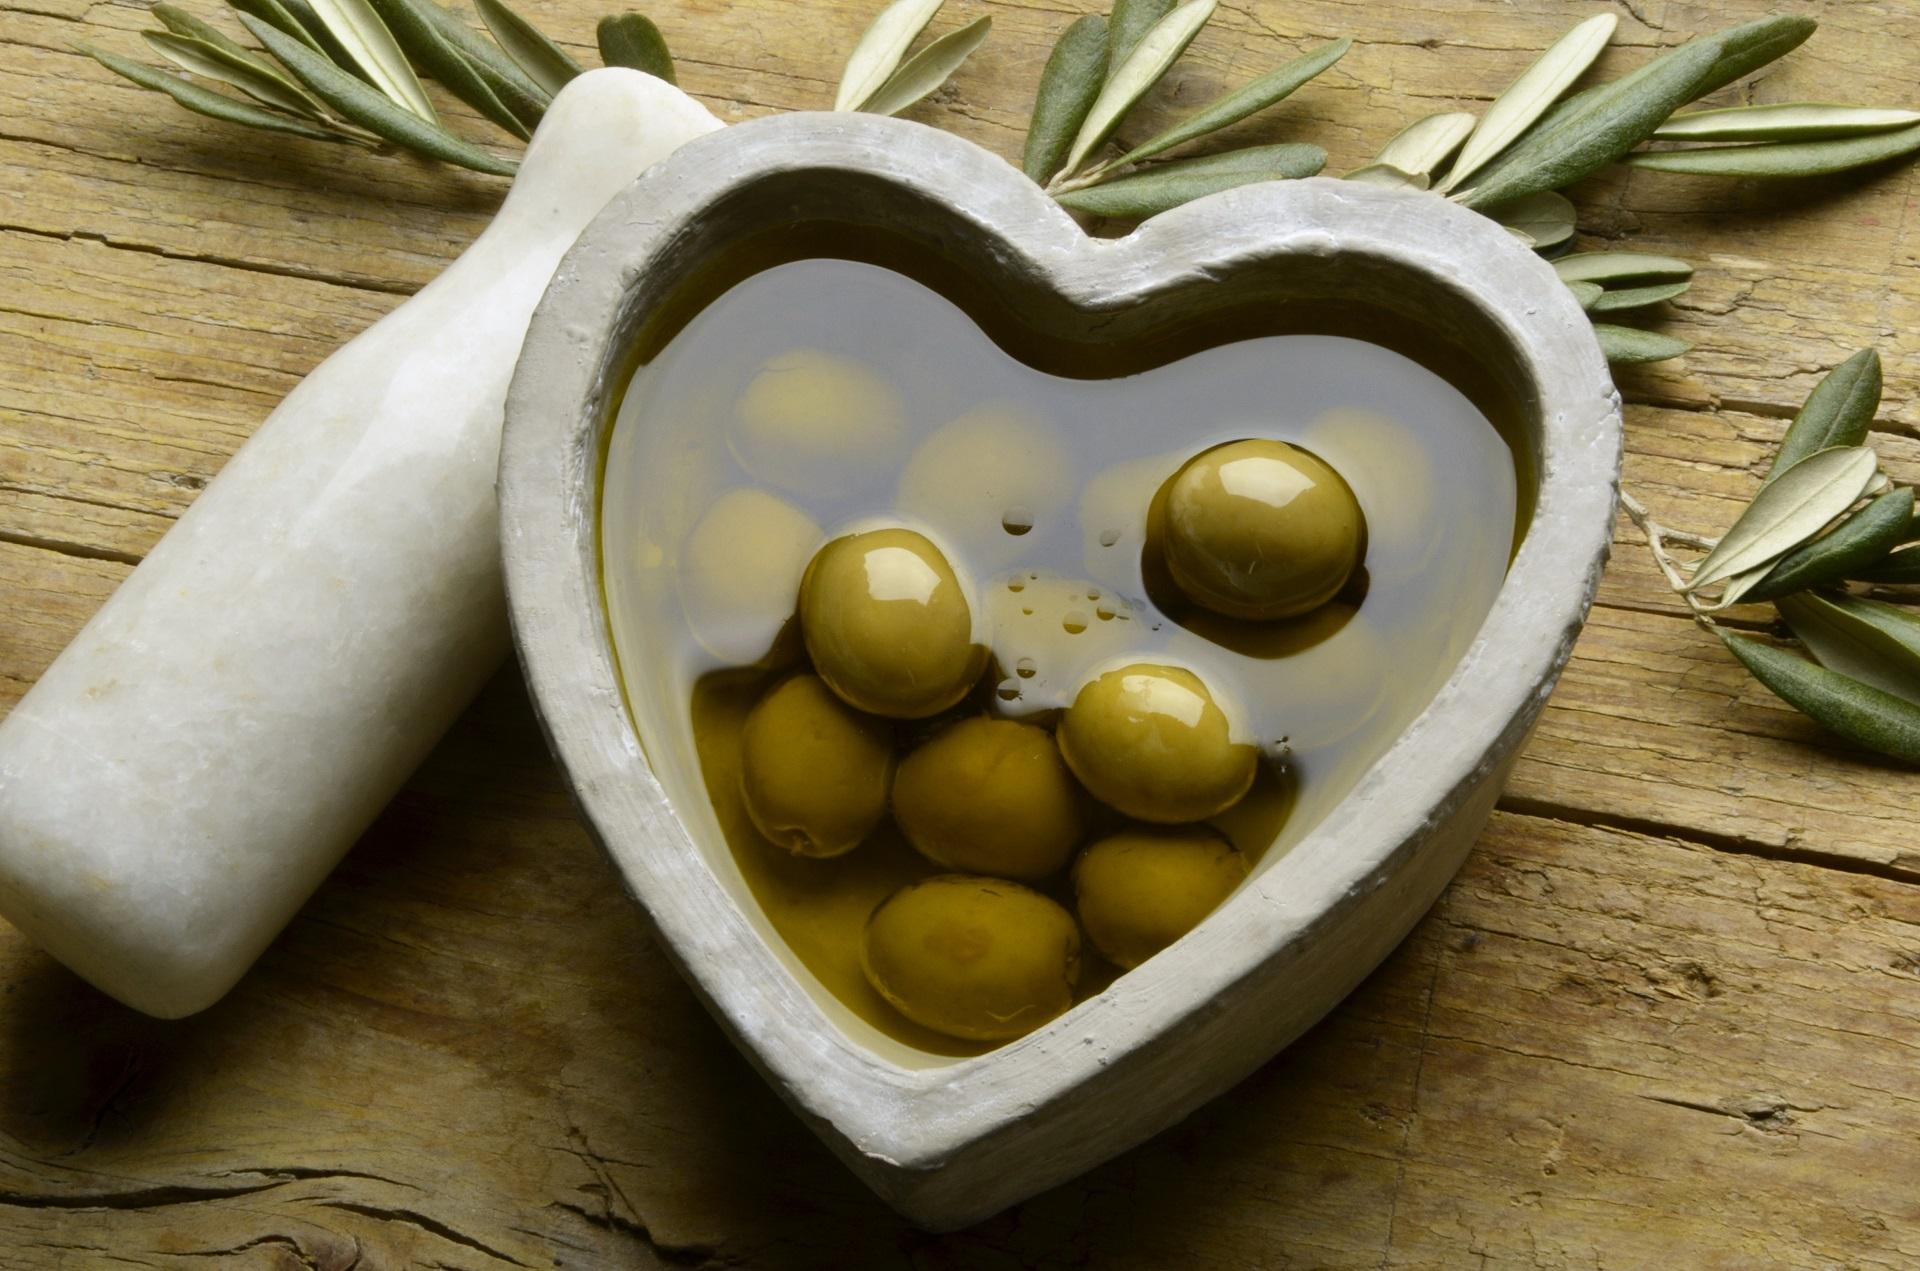 health-acropolis-olive-oil.jpg